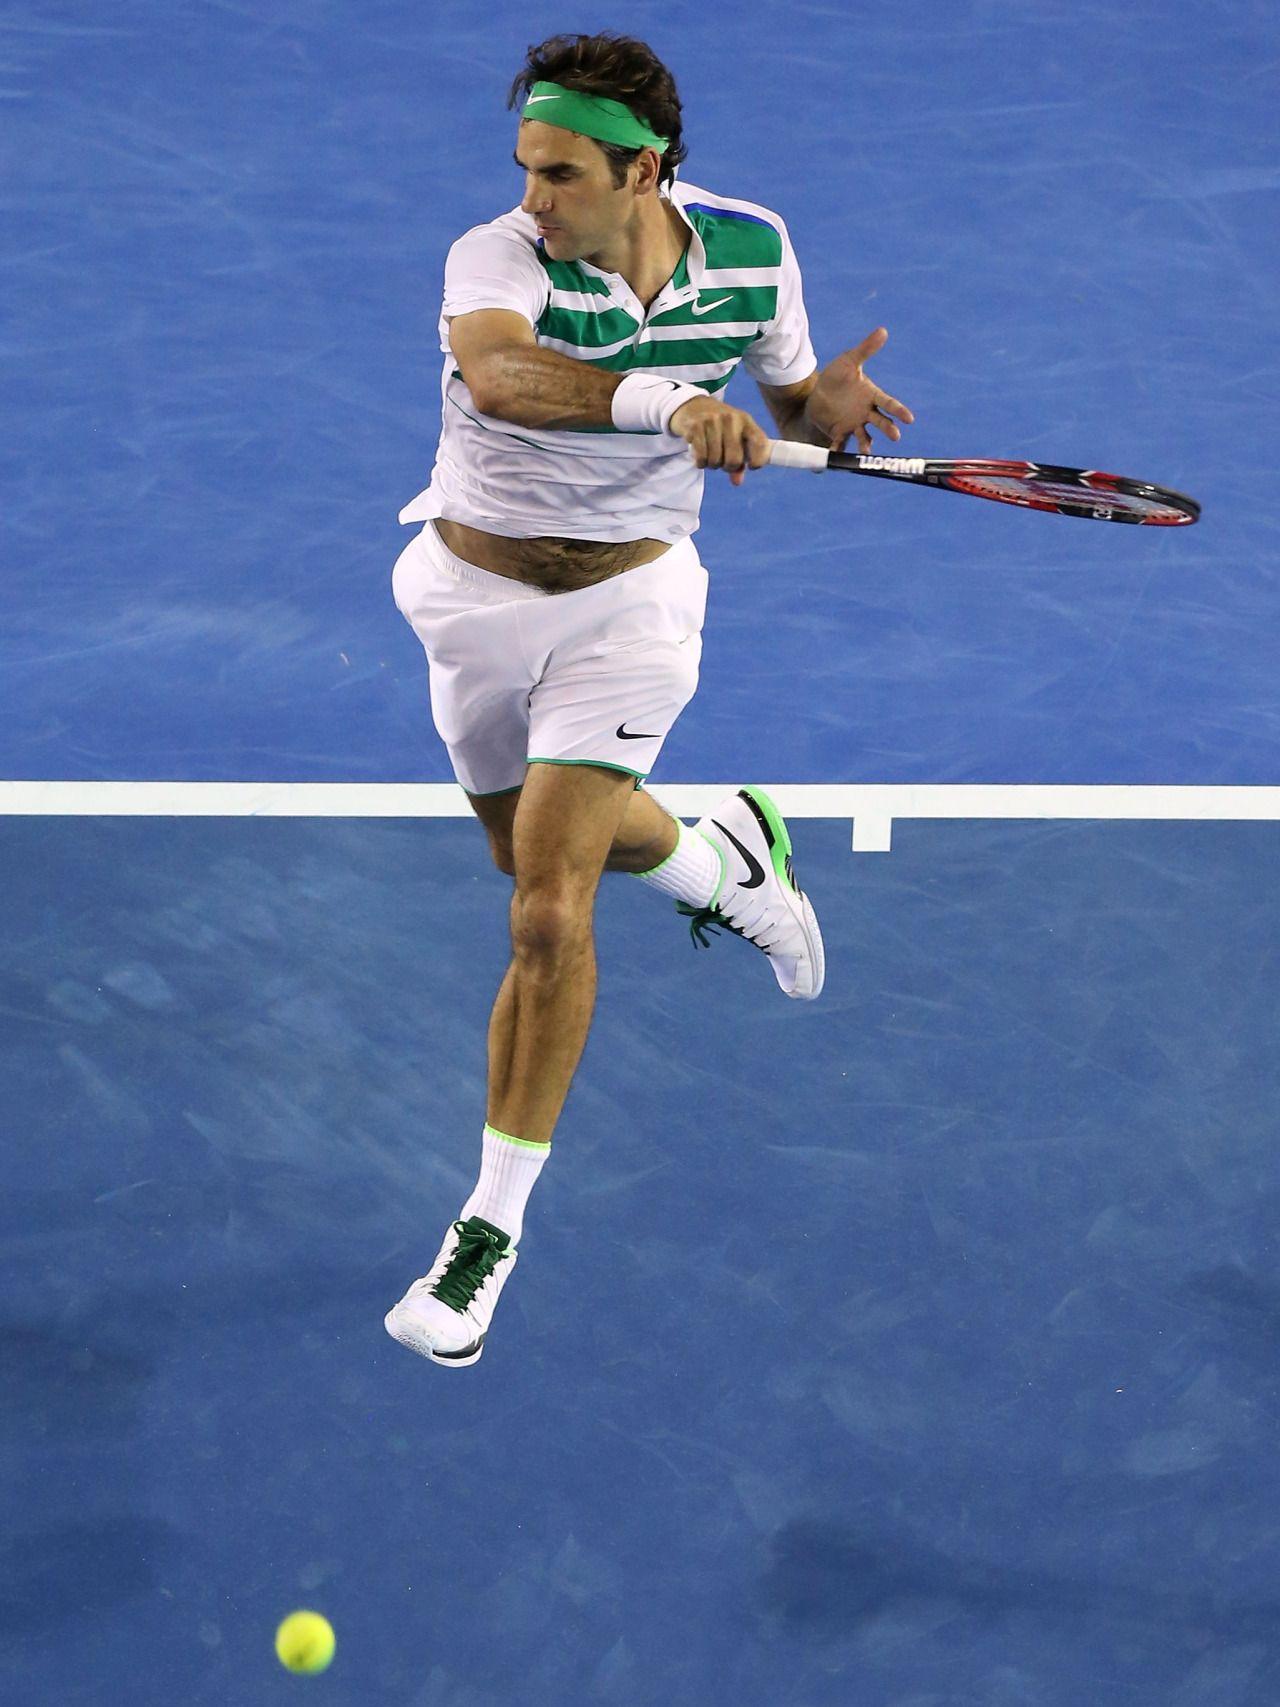 Roger Federer Becomes First Man To Win 300 Grand Slam Matches...: Roger Federer Becomes First Man To Win 300… #GrigorDimitrov #RogerFederer